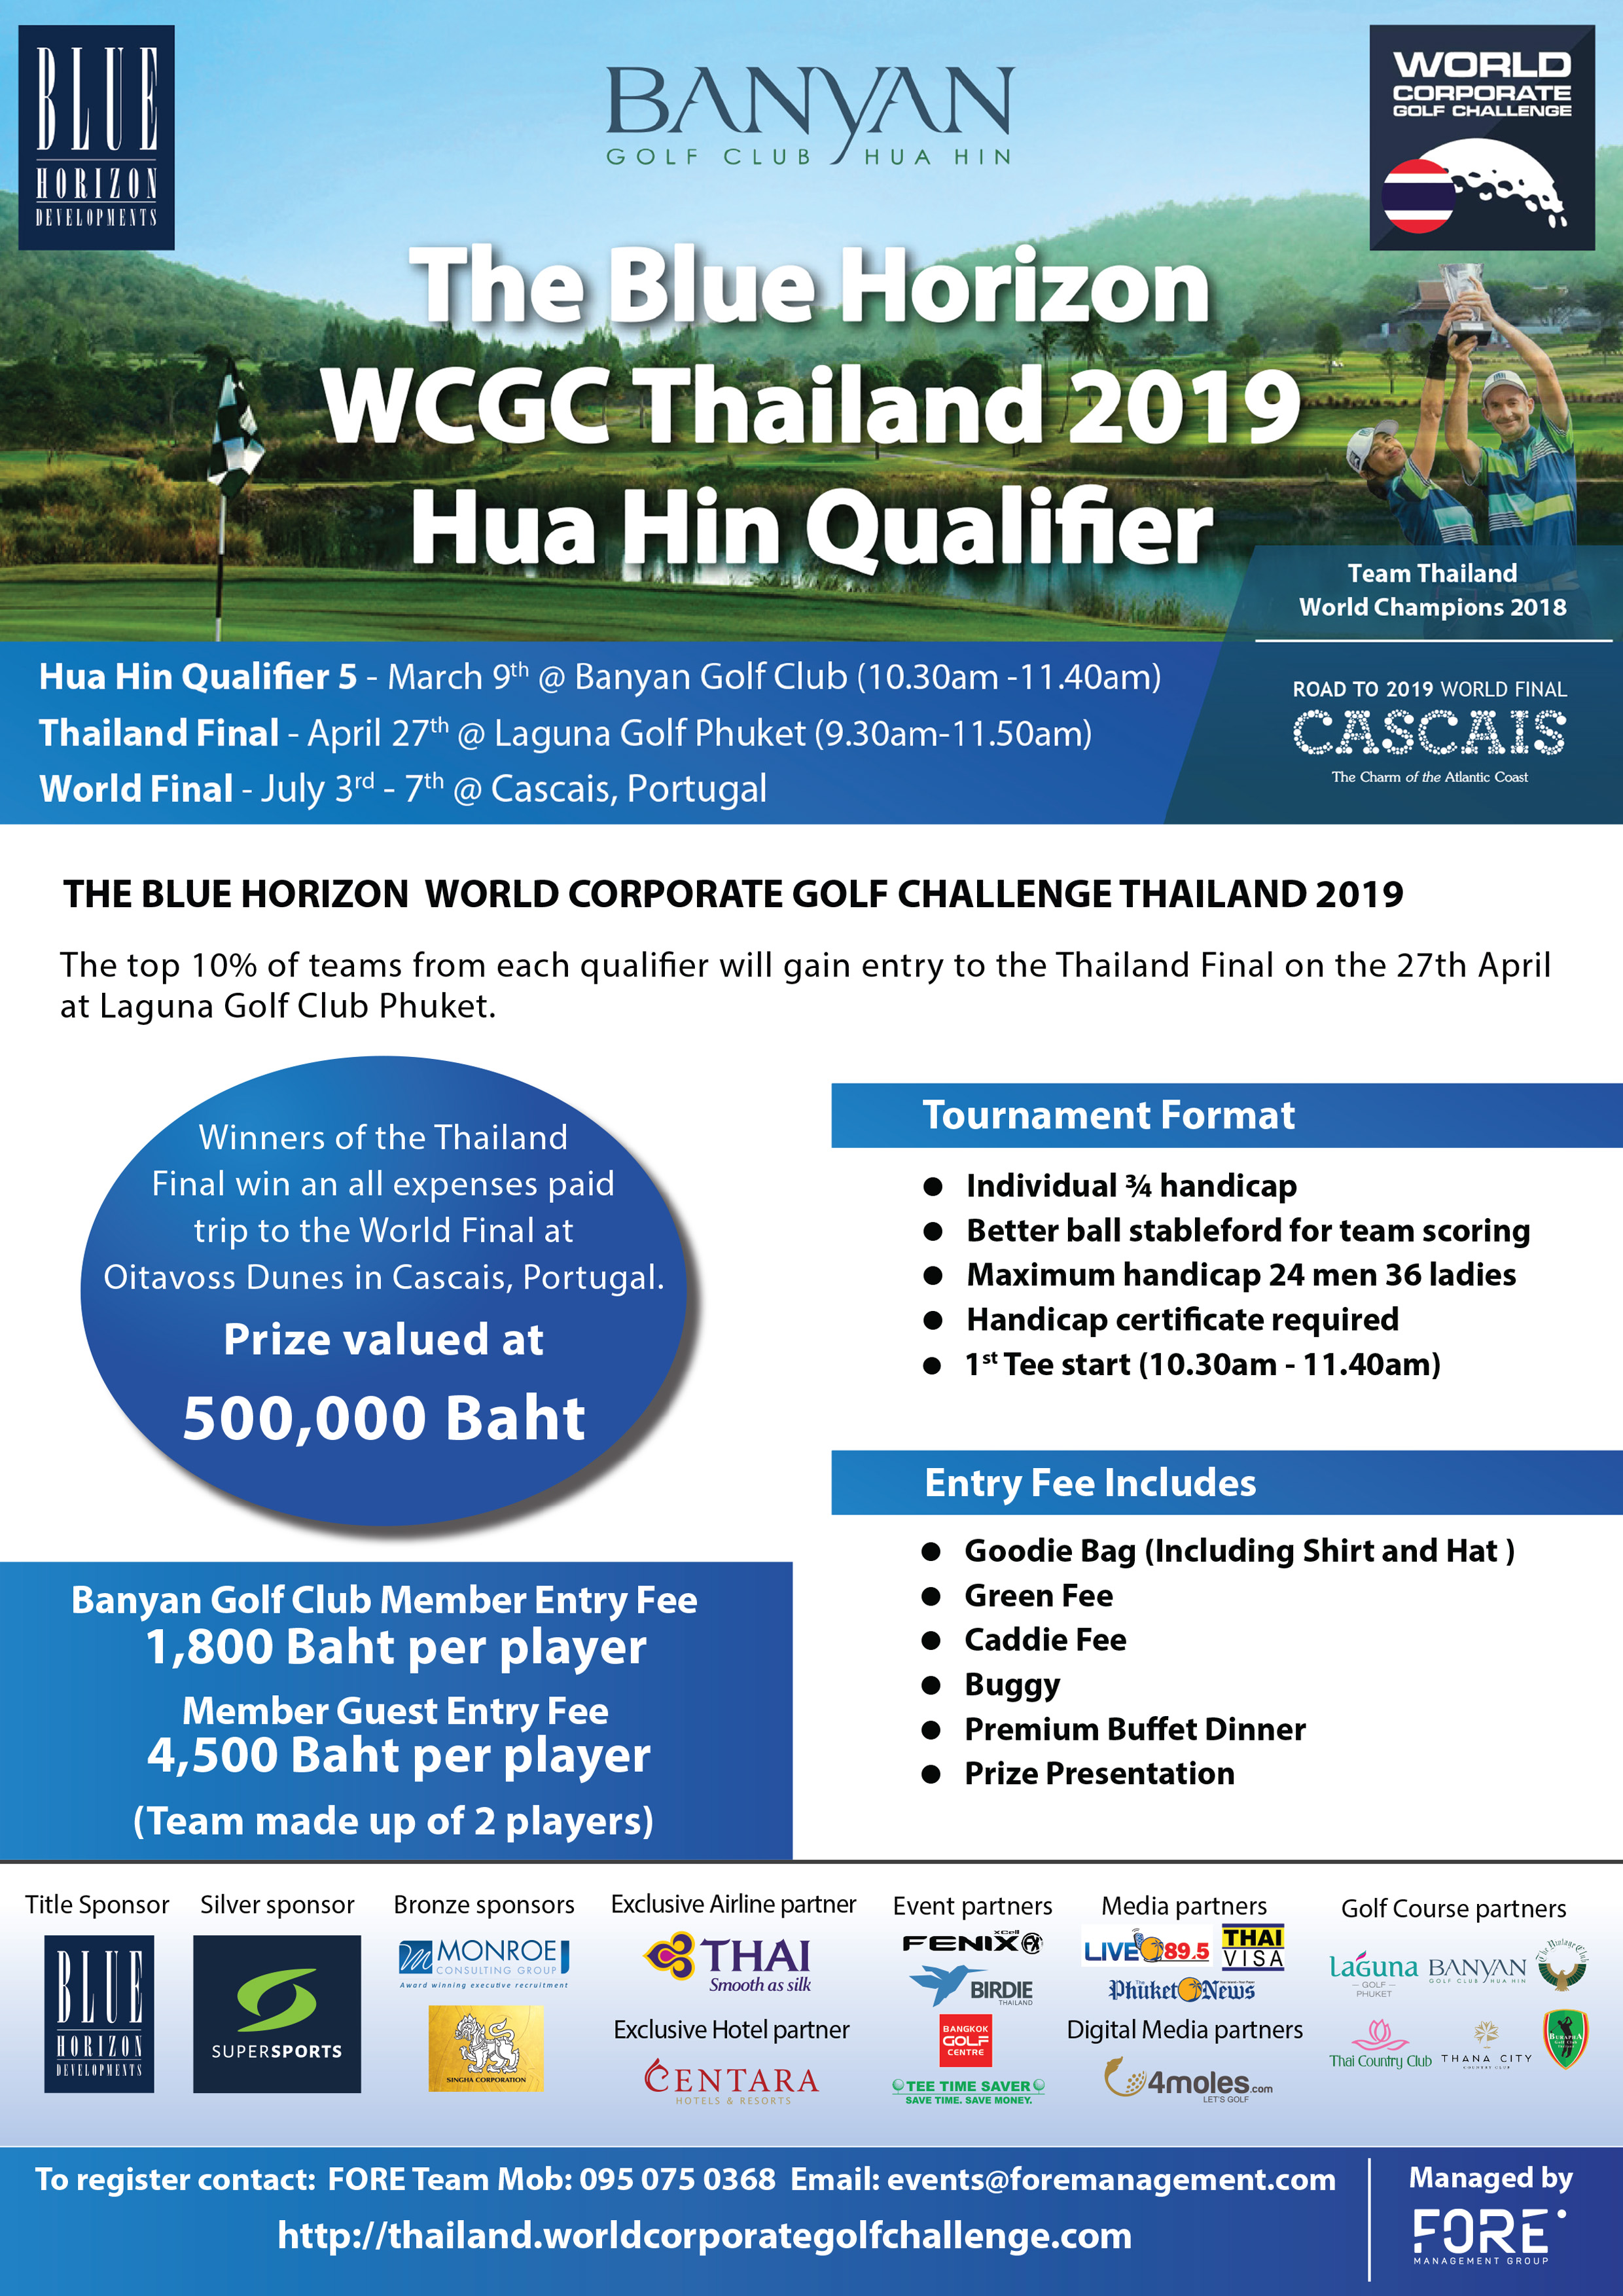 05 WCGC_Qualifier Poster(Hua Hin)-Banyan(Q5)_Member.jpg